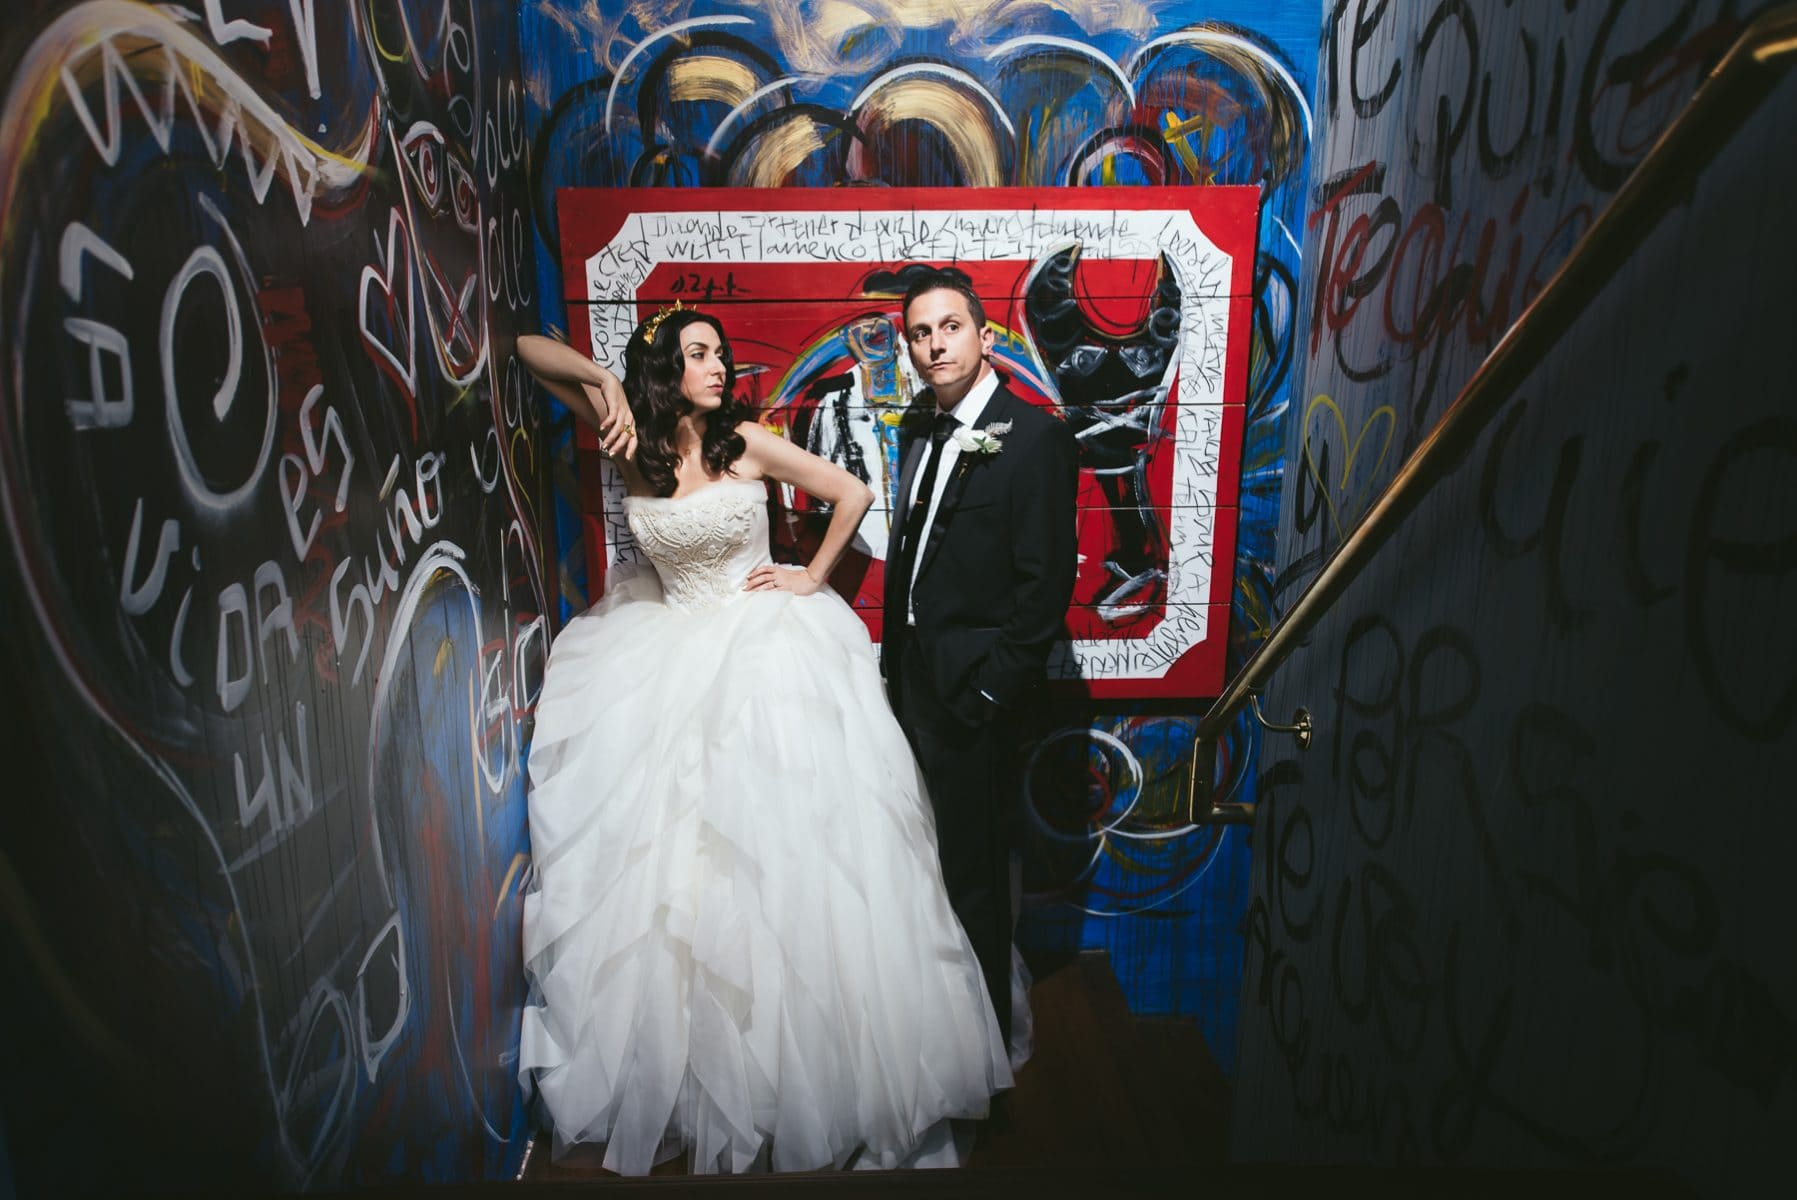 East Village Wedding